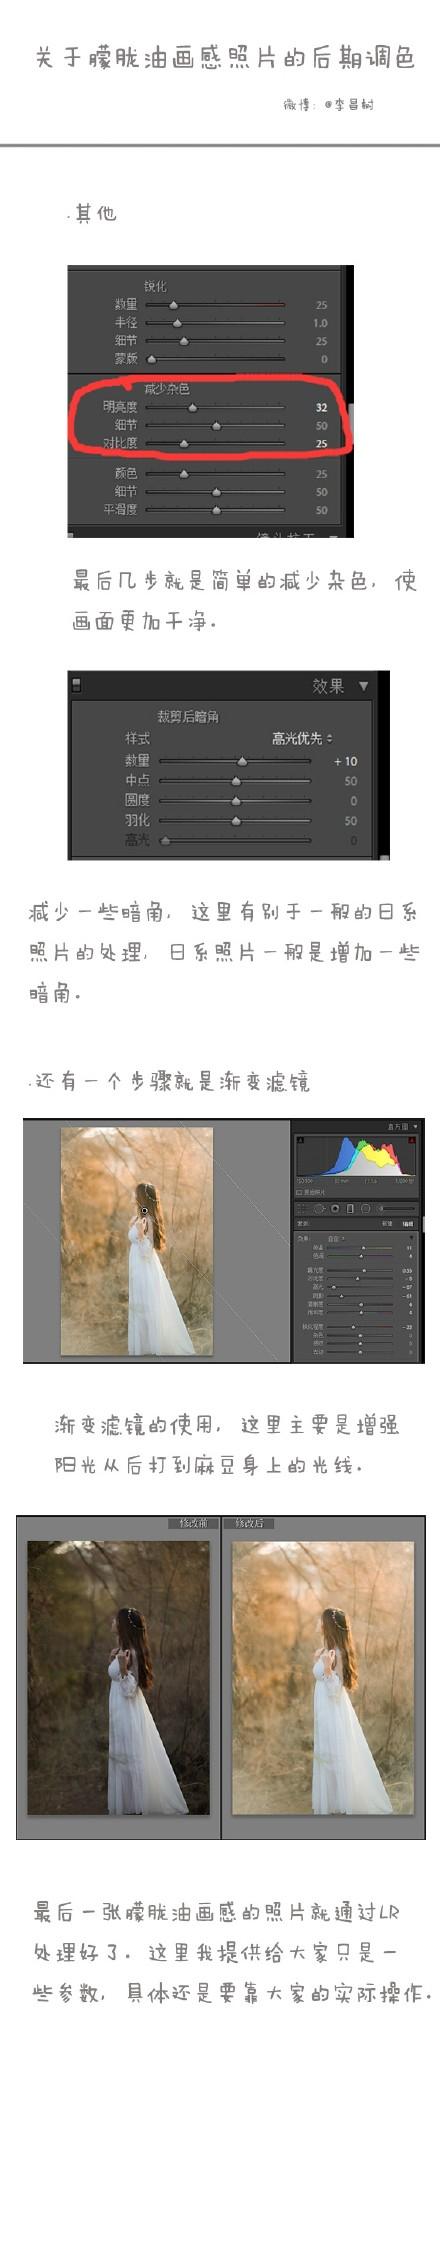 photoshop打造朦胧油画感照片后期调色技巧5